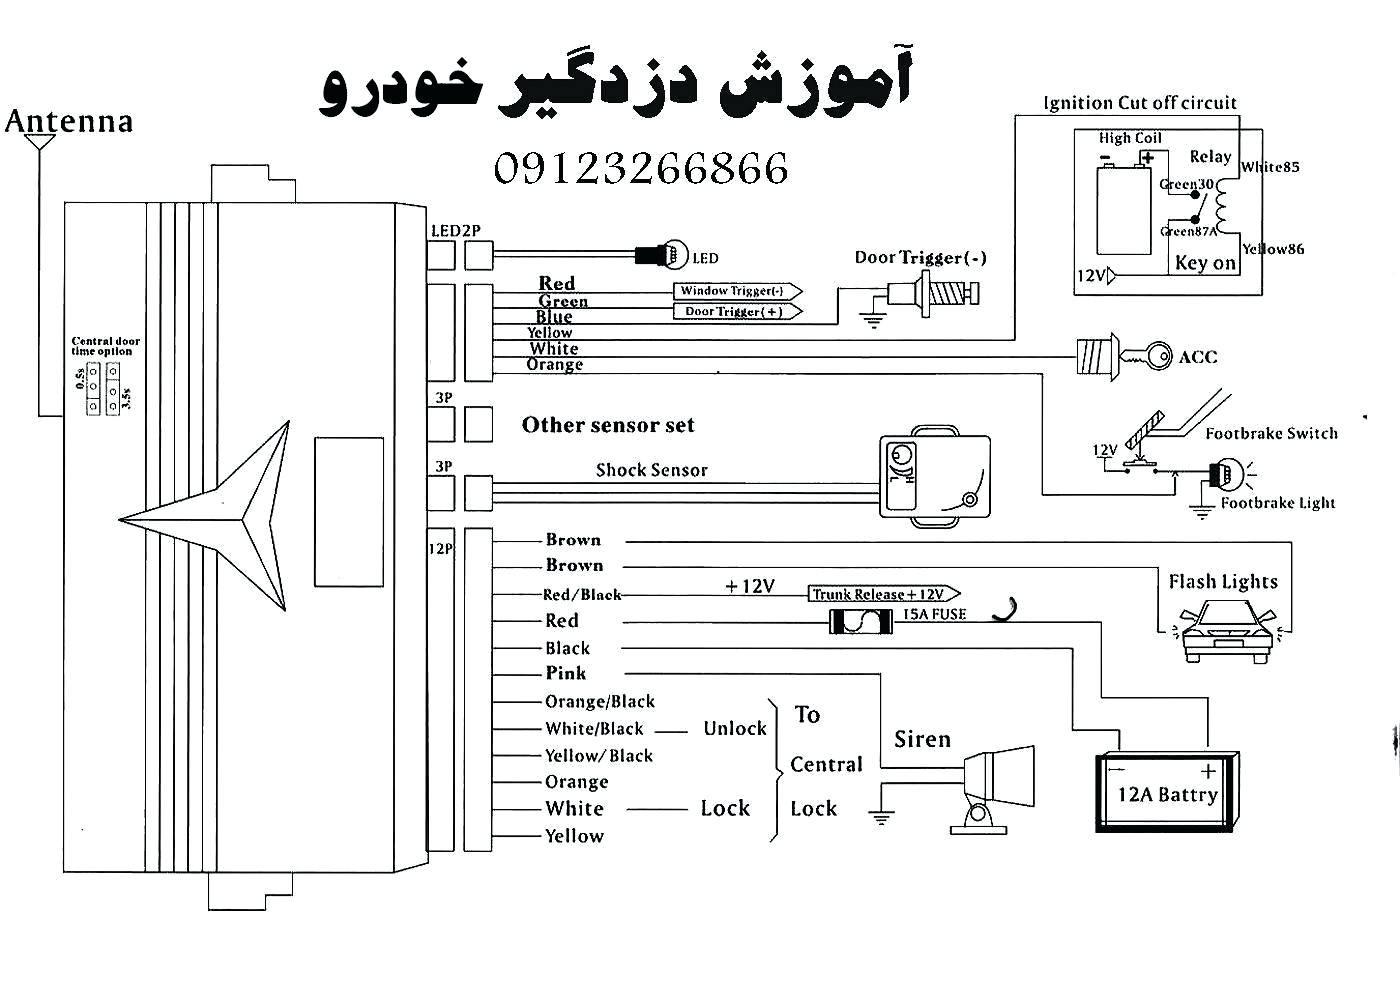 viper 300 wiring diagram viper 211hv wiring diagram viper alarm 5706v wiring diagram - wiring diagram